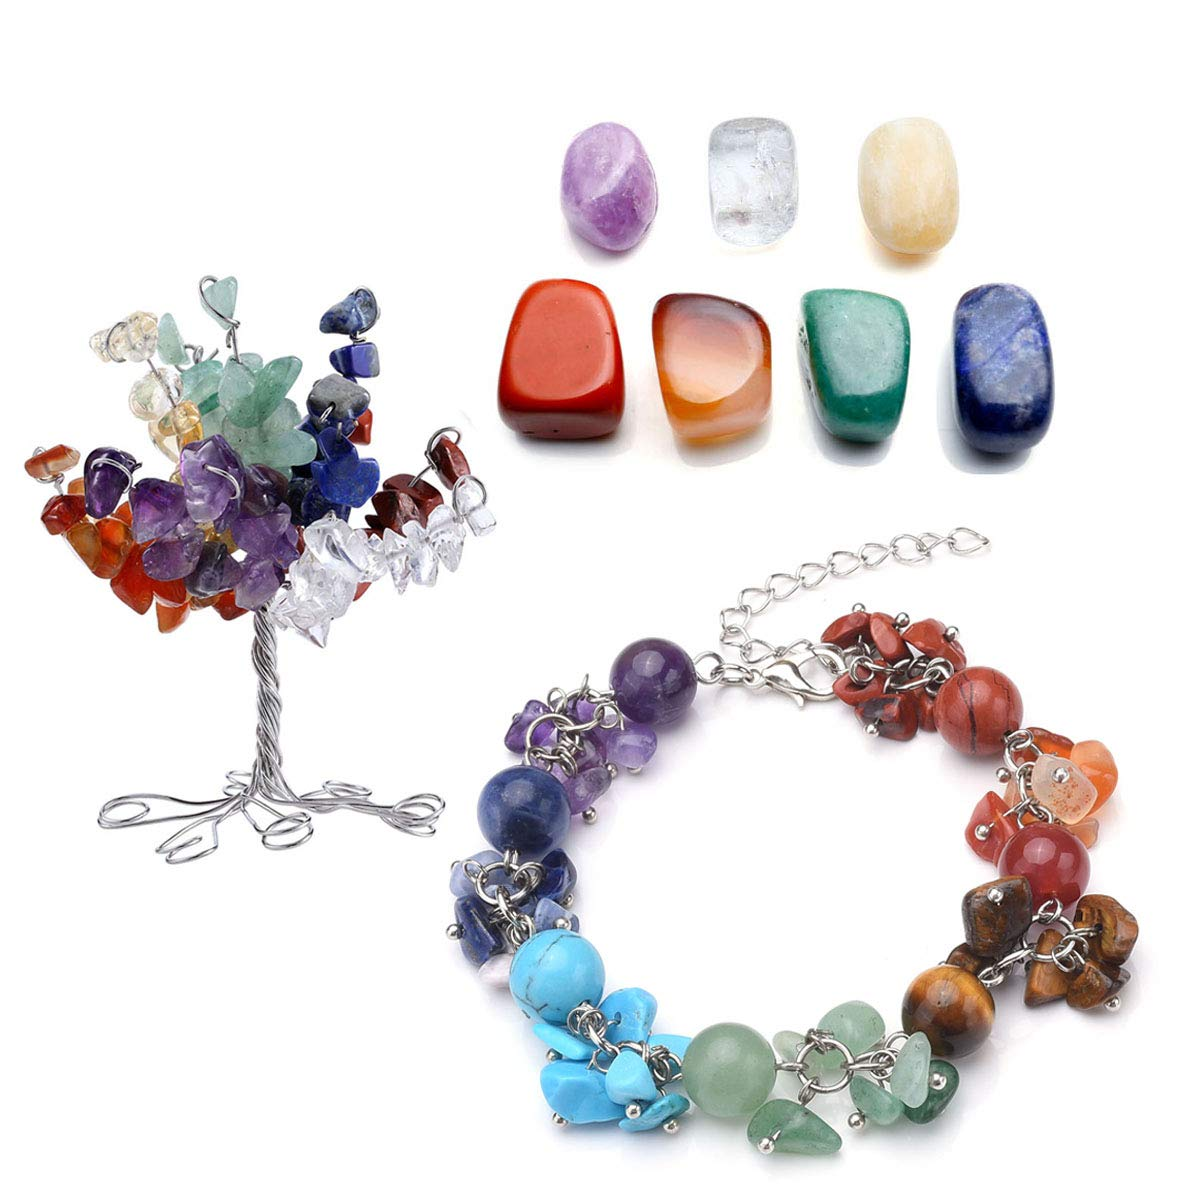 CrystalTears 7 Chakra Gems Set,Money Tree & Irregular Chakra Stones & 7 Chakra Brarcelet Lotus Pendant Reiki Healing Crystal Feng Shui Spiritual Decor Ornaments (7 Chakra-Chips Stones)